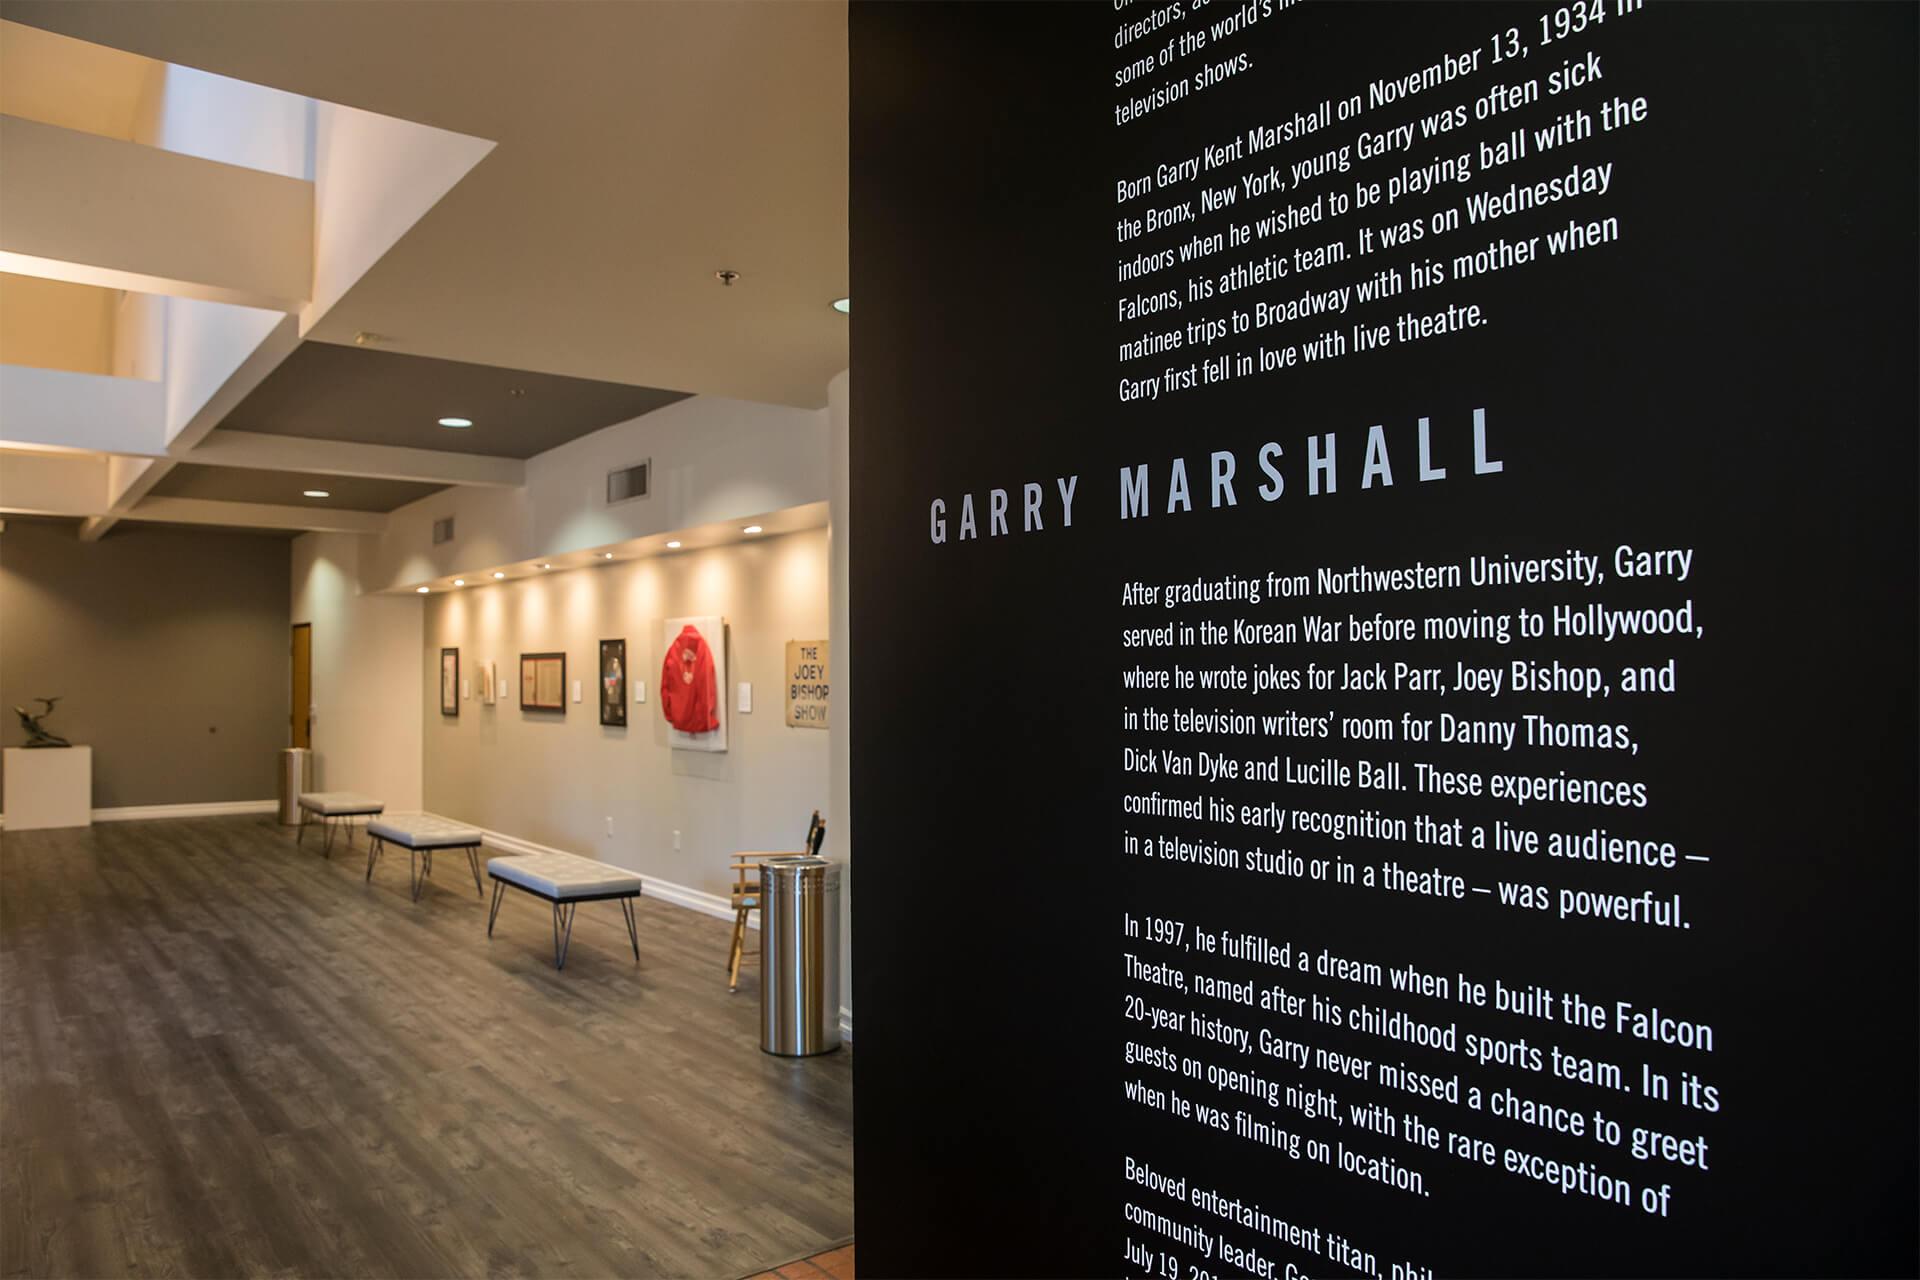 GarryMarshall1